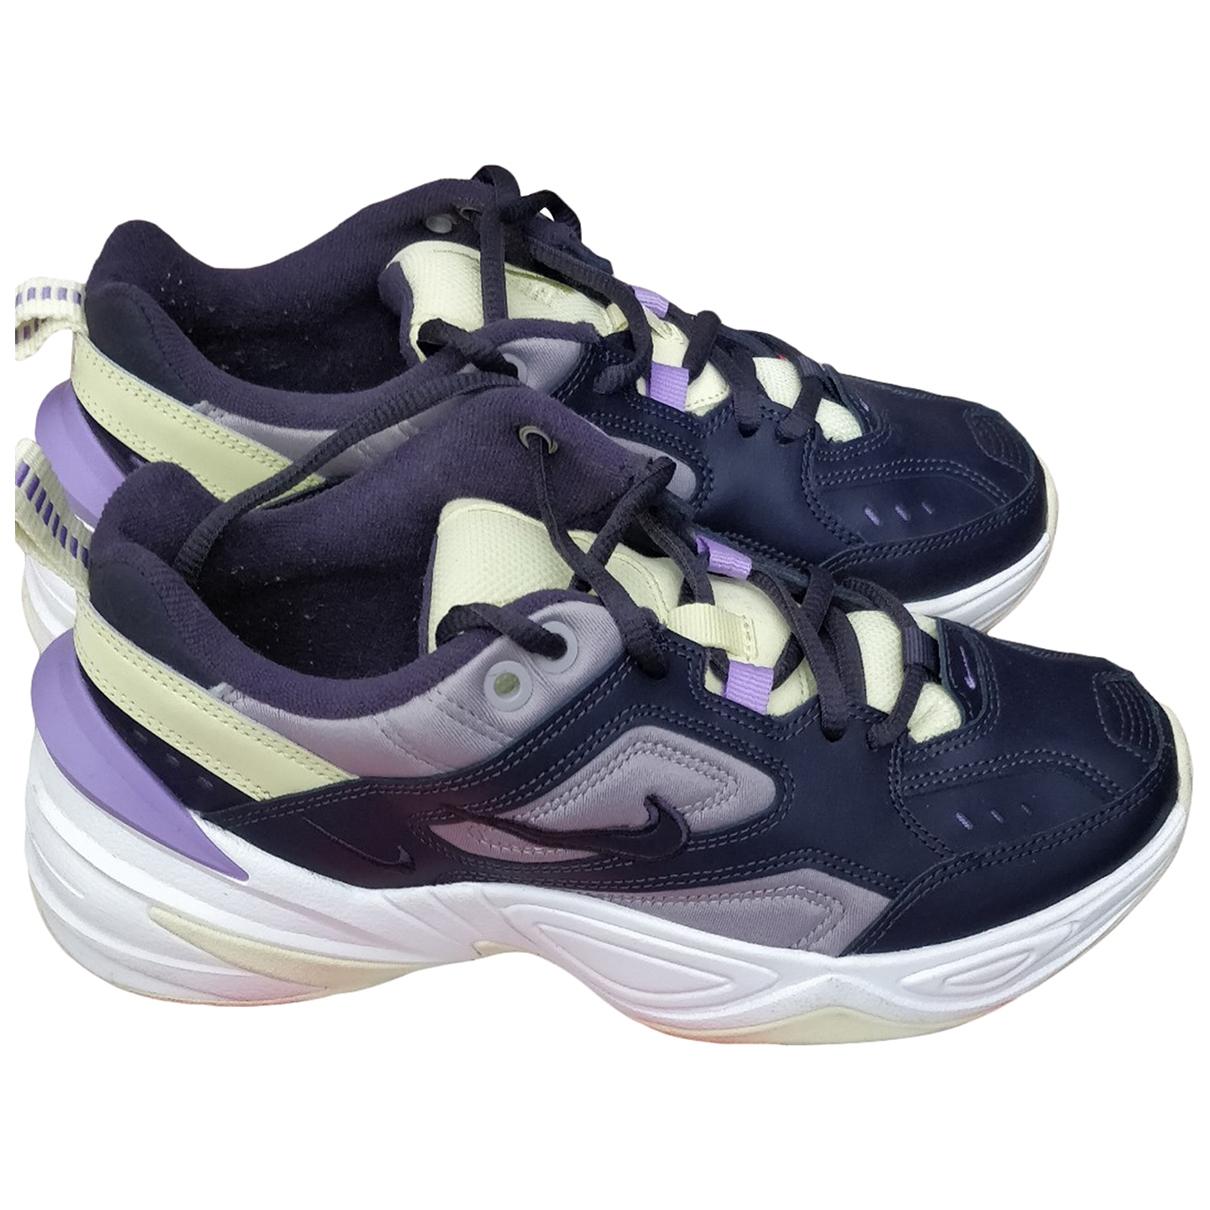 Nike - Baskets M2K Tekno pour femme - anthracite